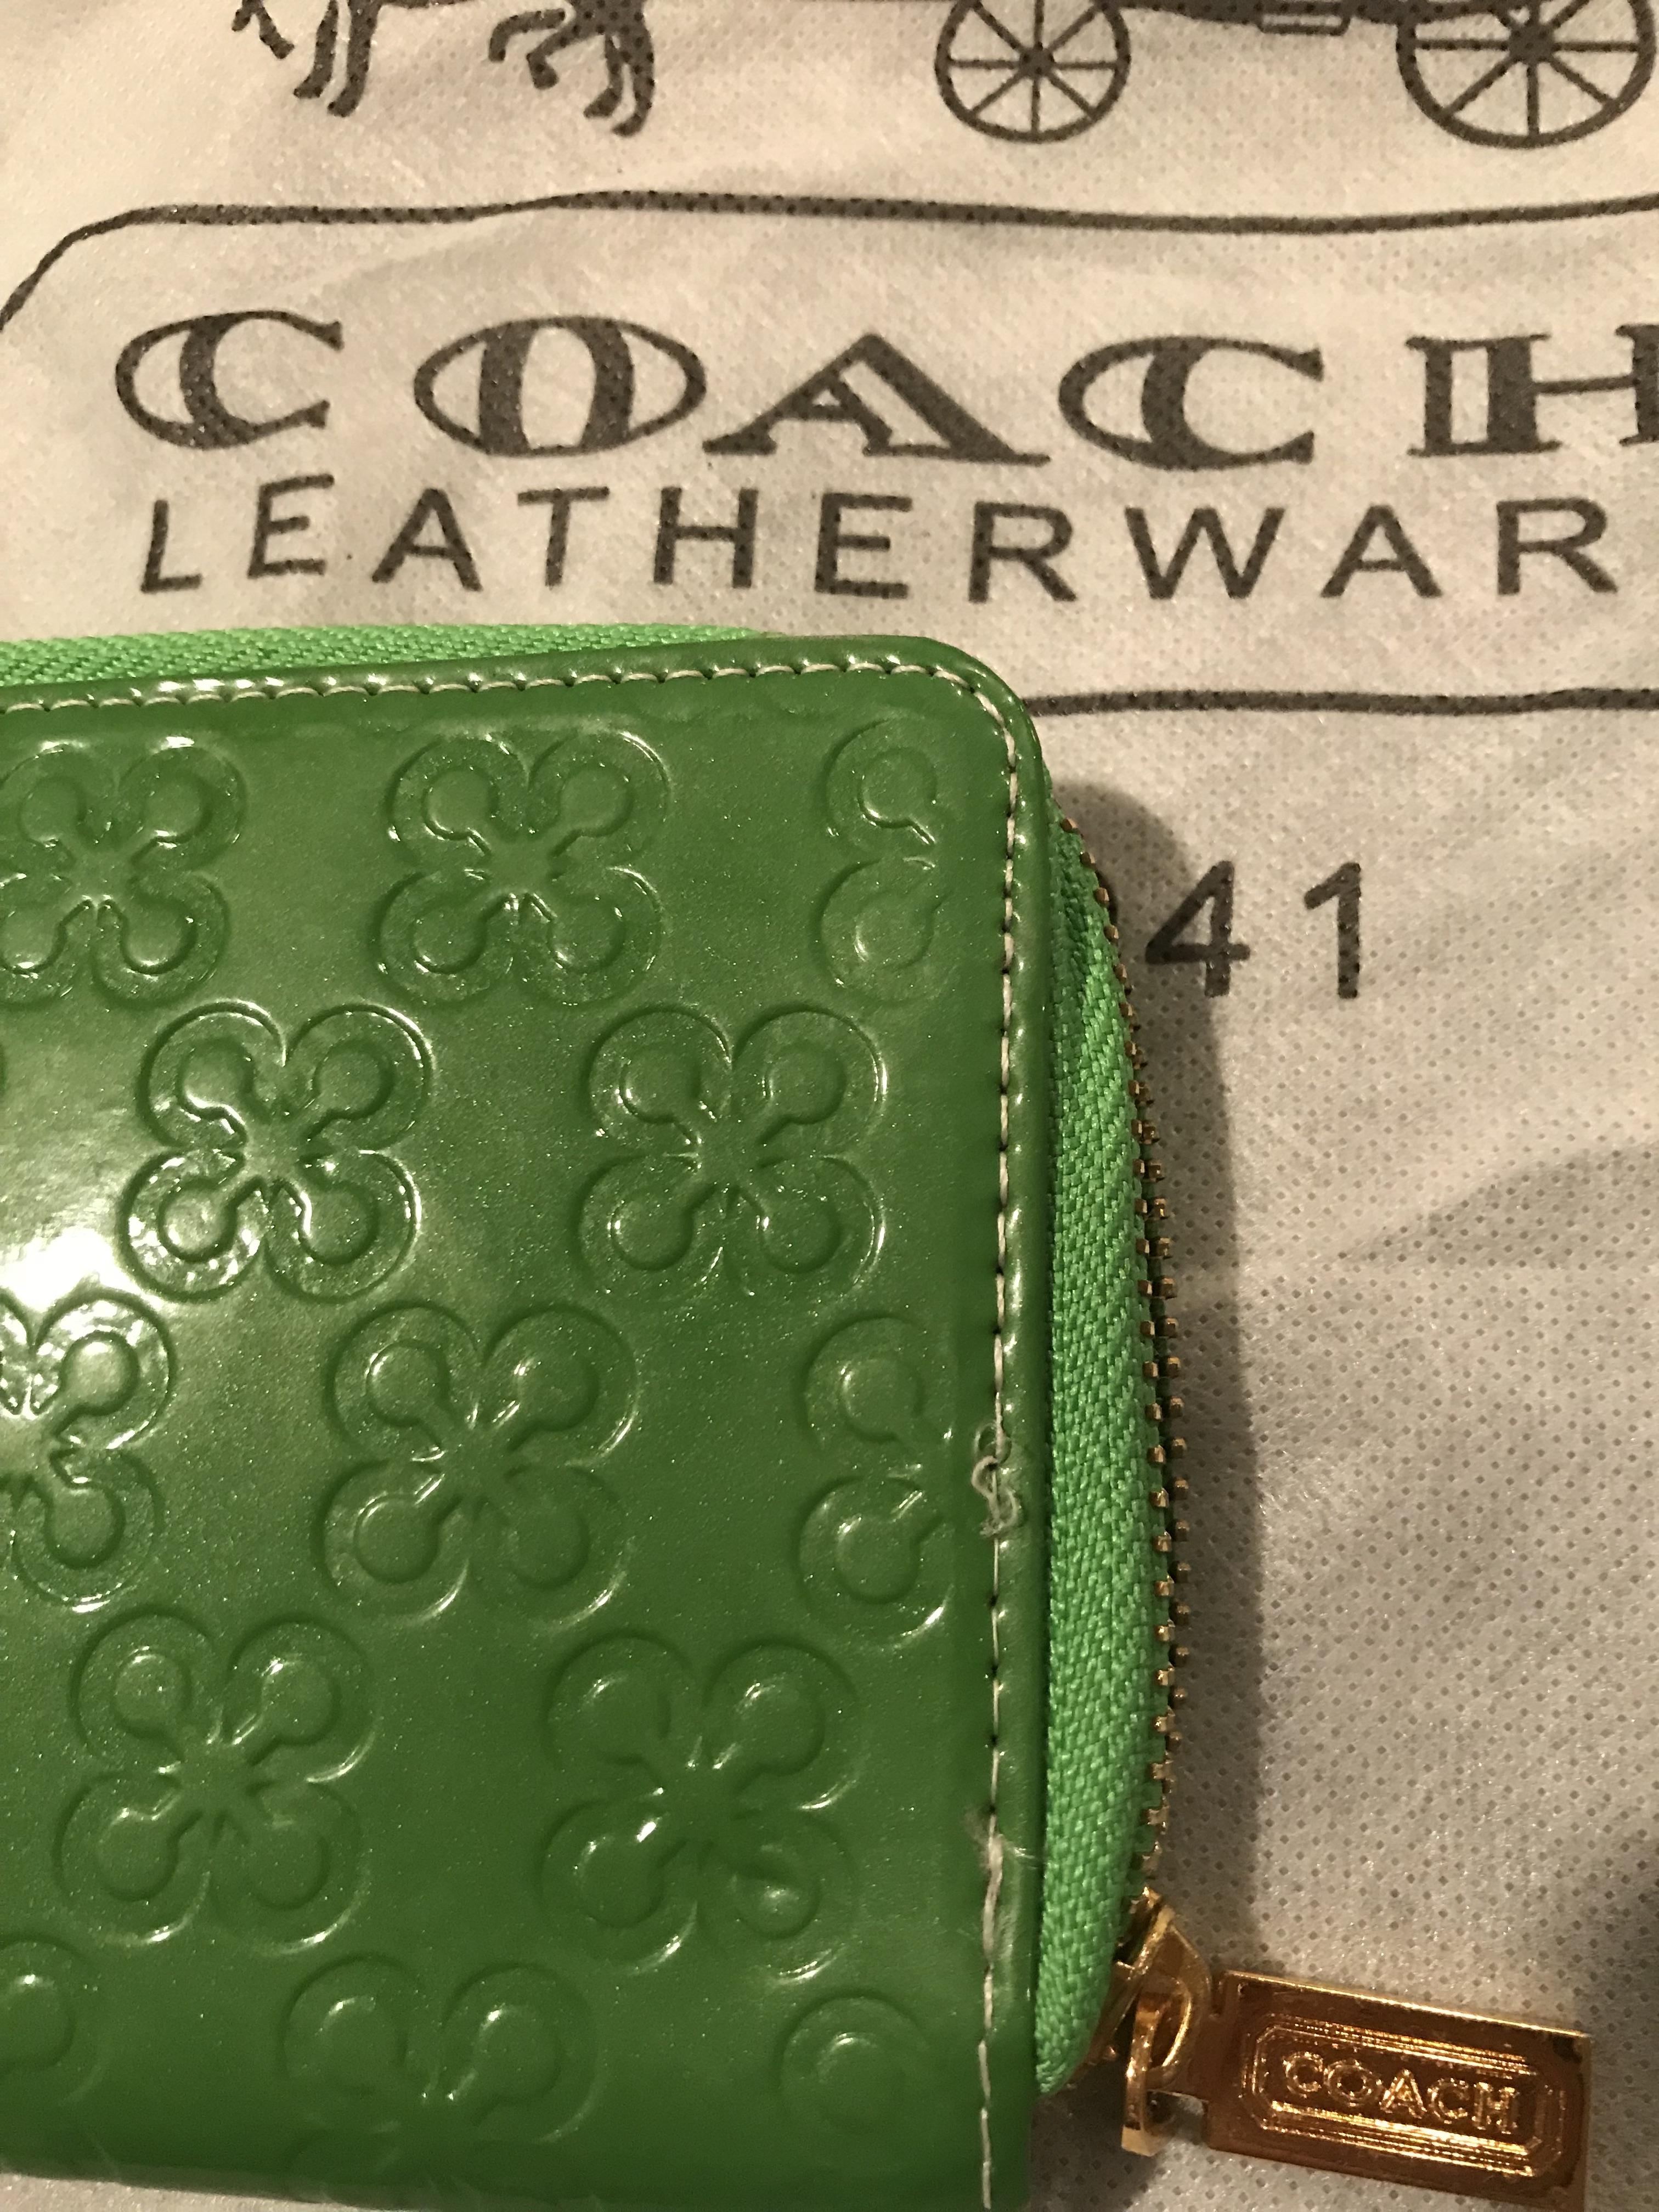 73176f8f4b Coach-Outlet Reviews - 118 Reviews of Coach-outlet.com